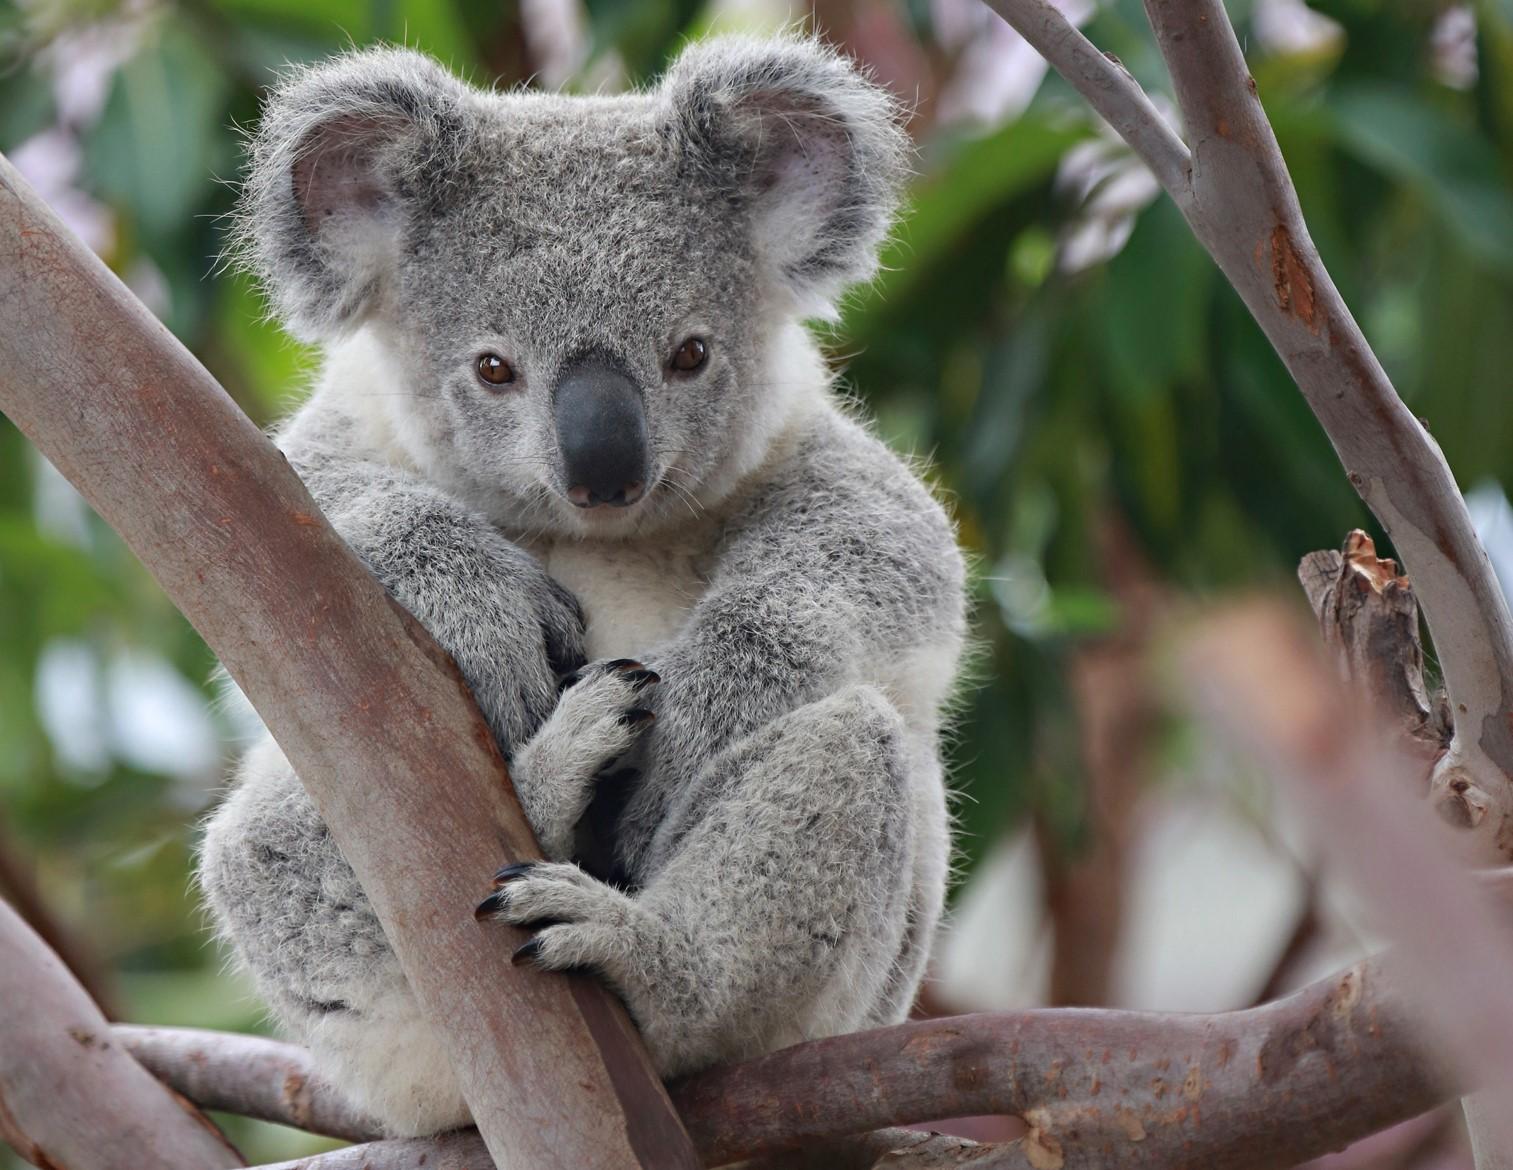 Koala_pic_no_logo.jpg